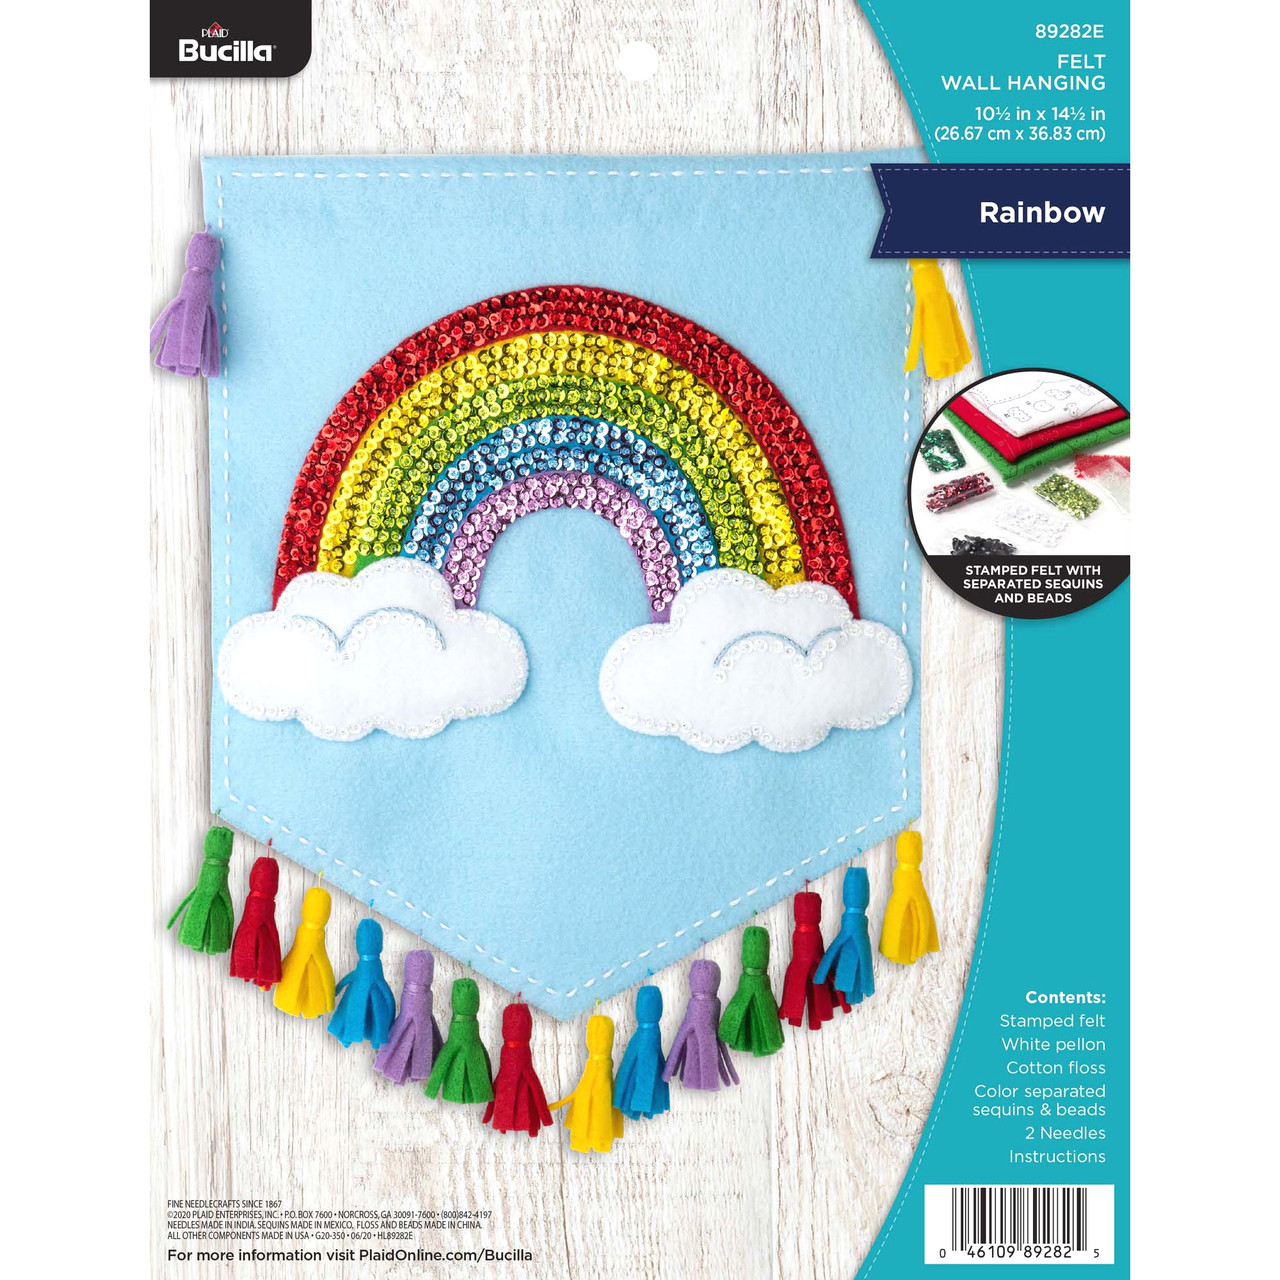 Plaid / Bucilla -  Rainbow Wall Hanging